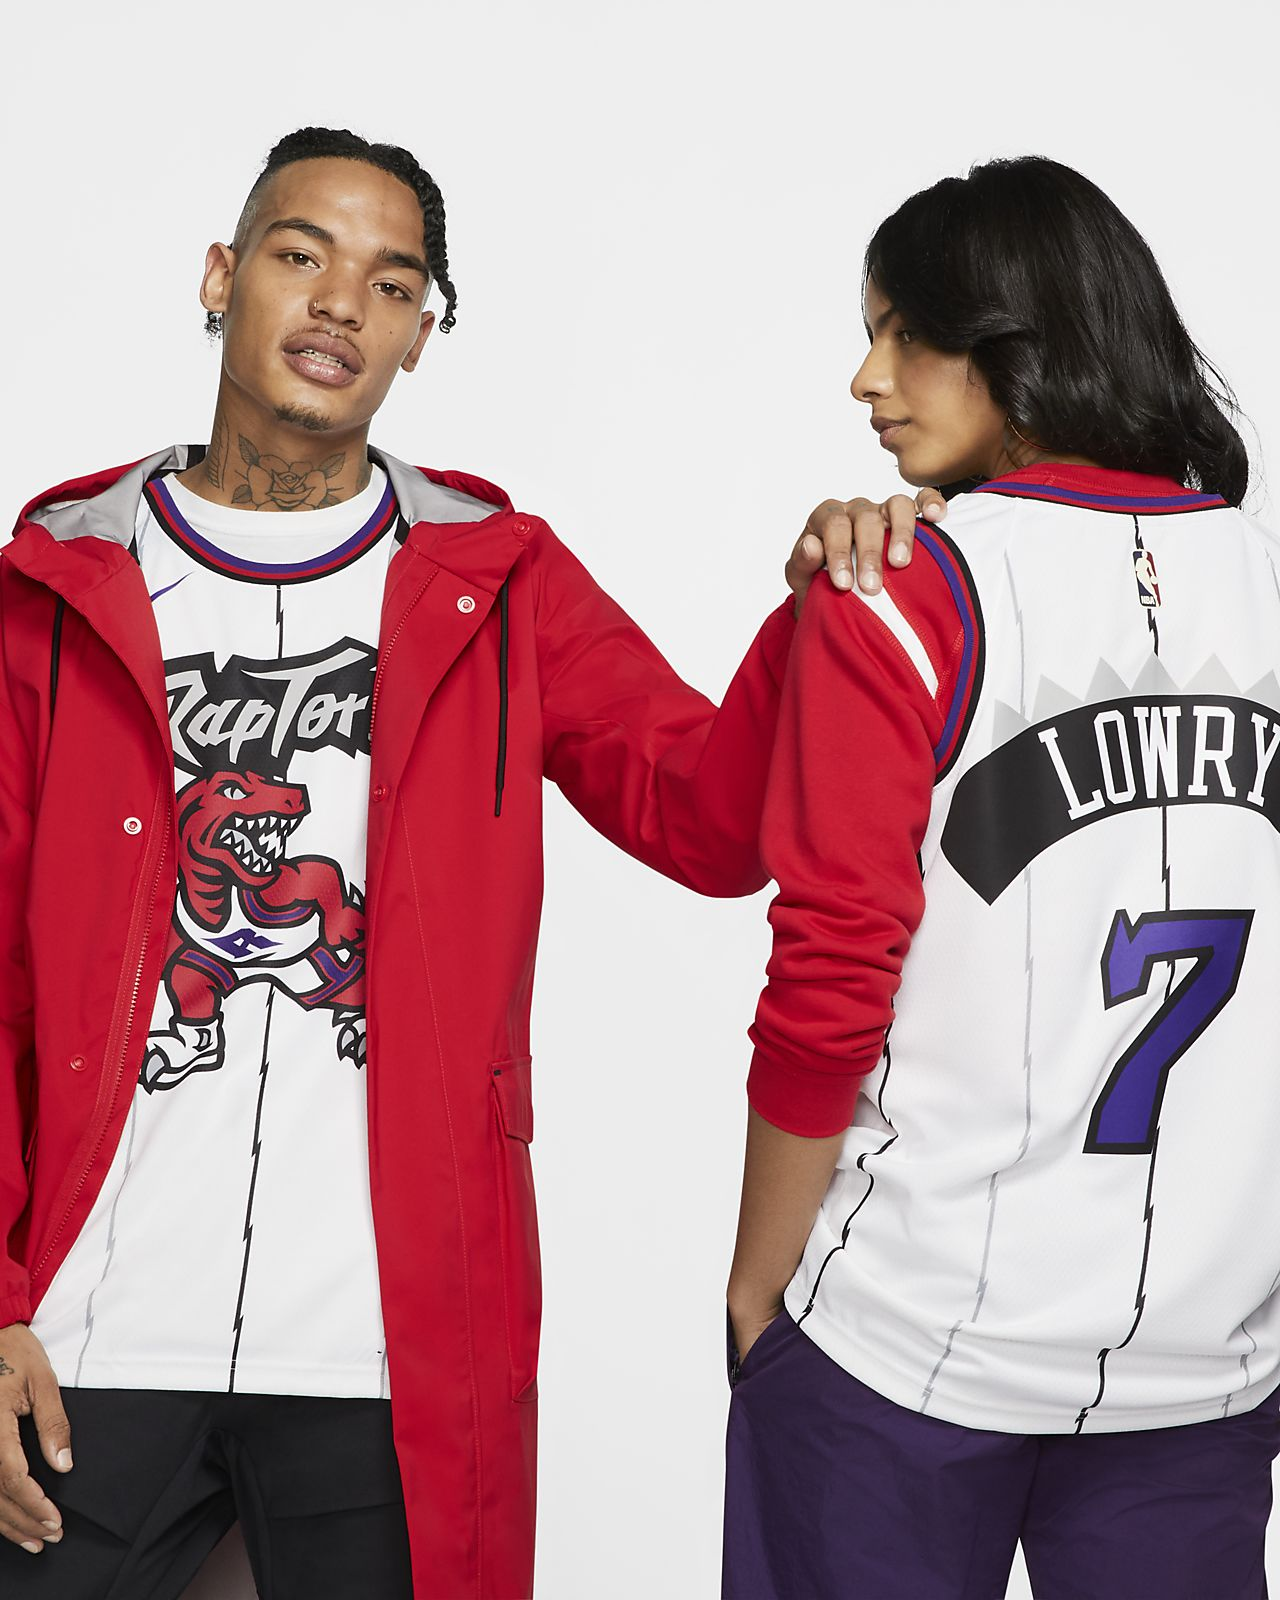 Kyle Lowry Raptors Classic Edition Swingman Nike NBA-jersey